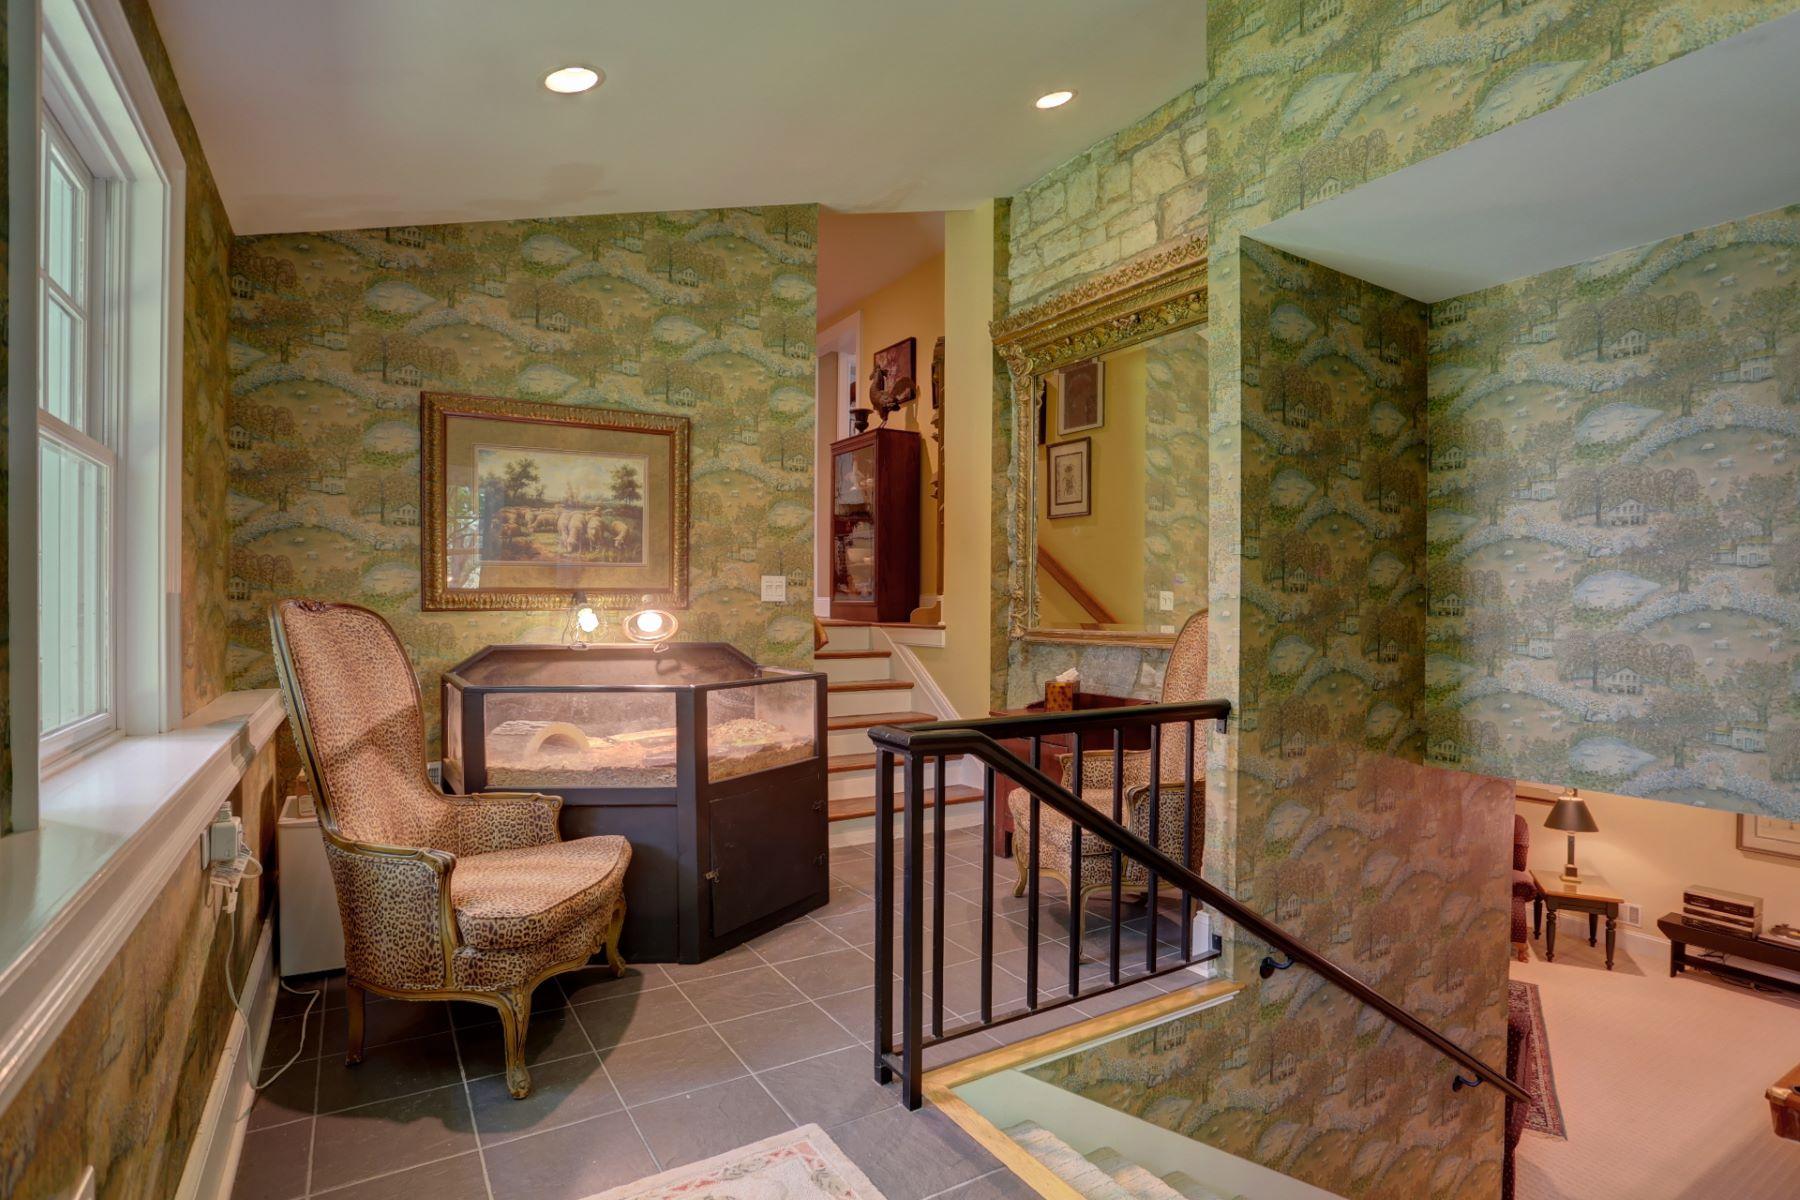 Additional photo for property listing at 23 Warwick Road  Lititz, Pennsylvania 17543 Estados Unidos